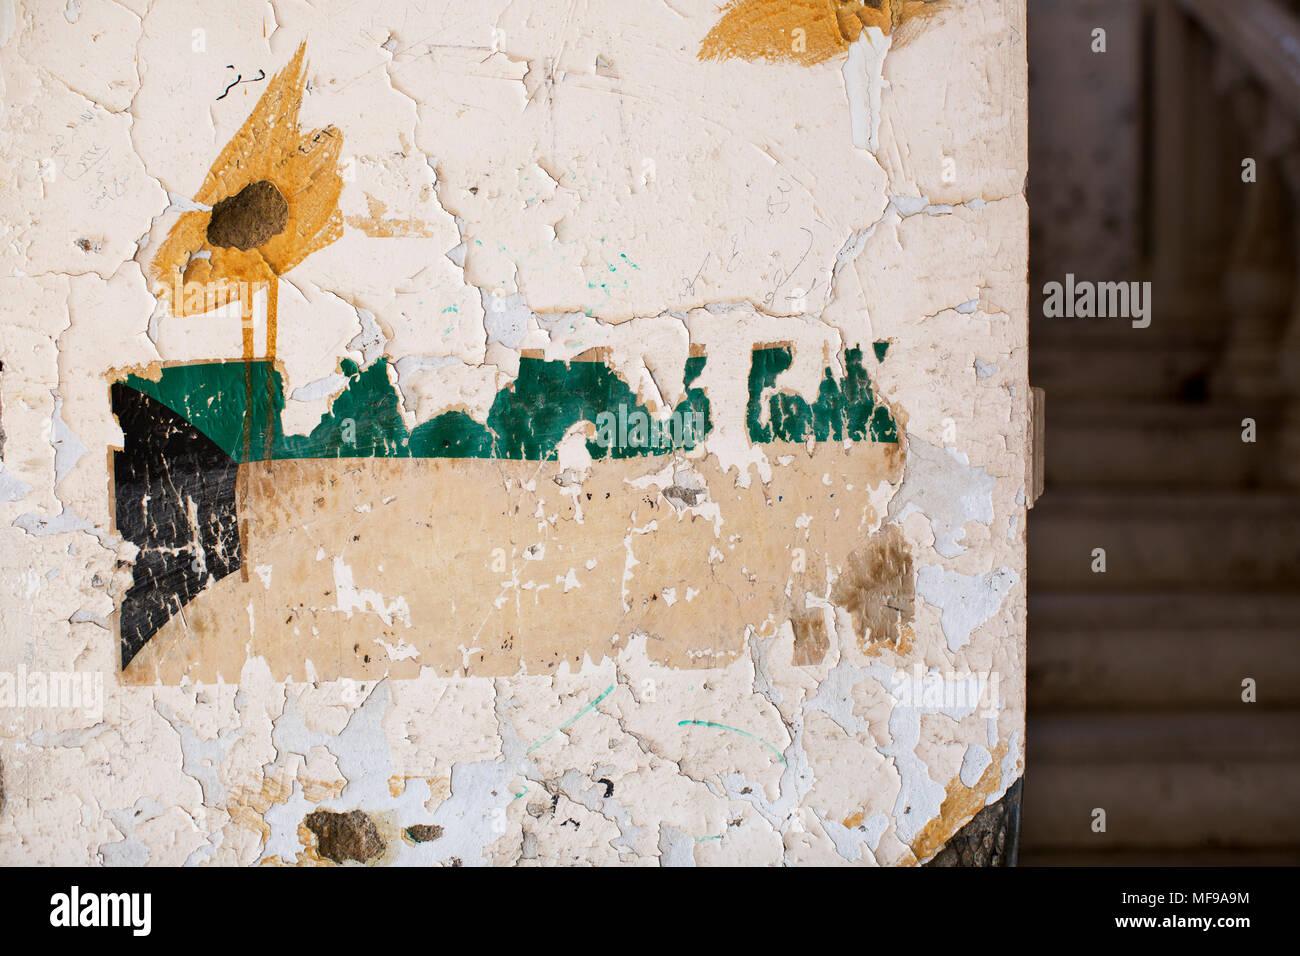 Al Qurain Martyrs Museum, Kuwait - Stock Image